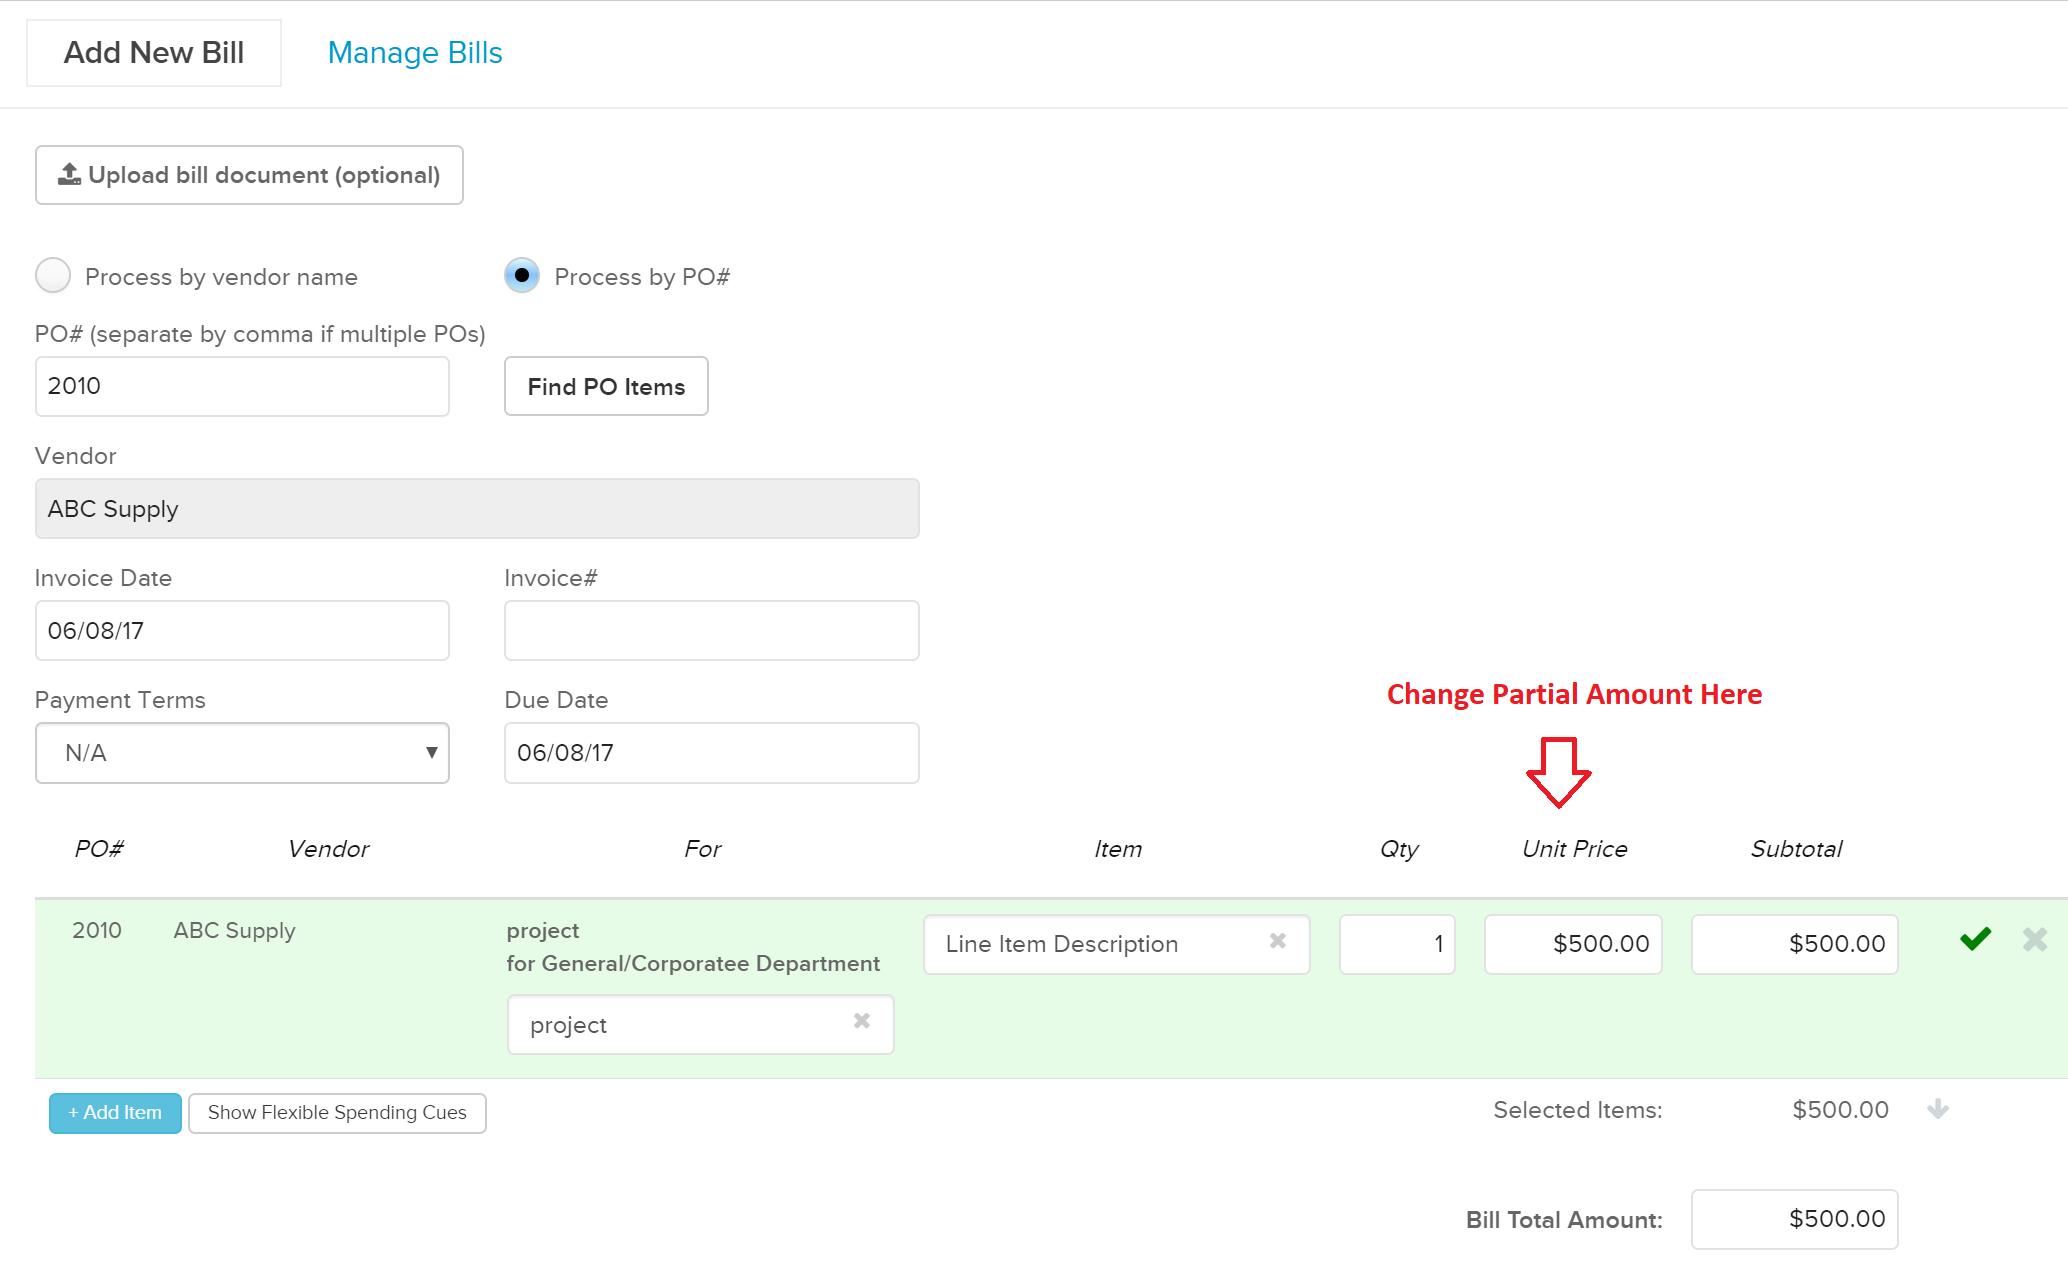 FlexSpend2 How to log multiple bills against a flexible spending PO